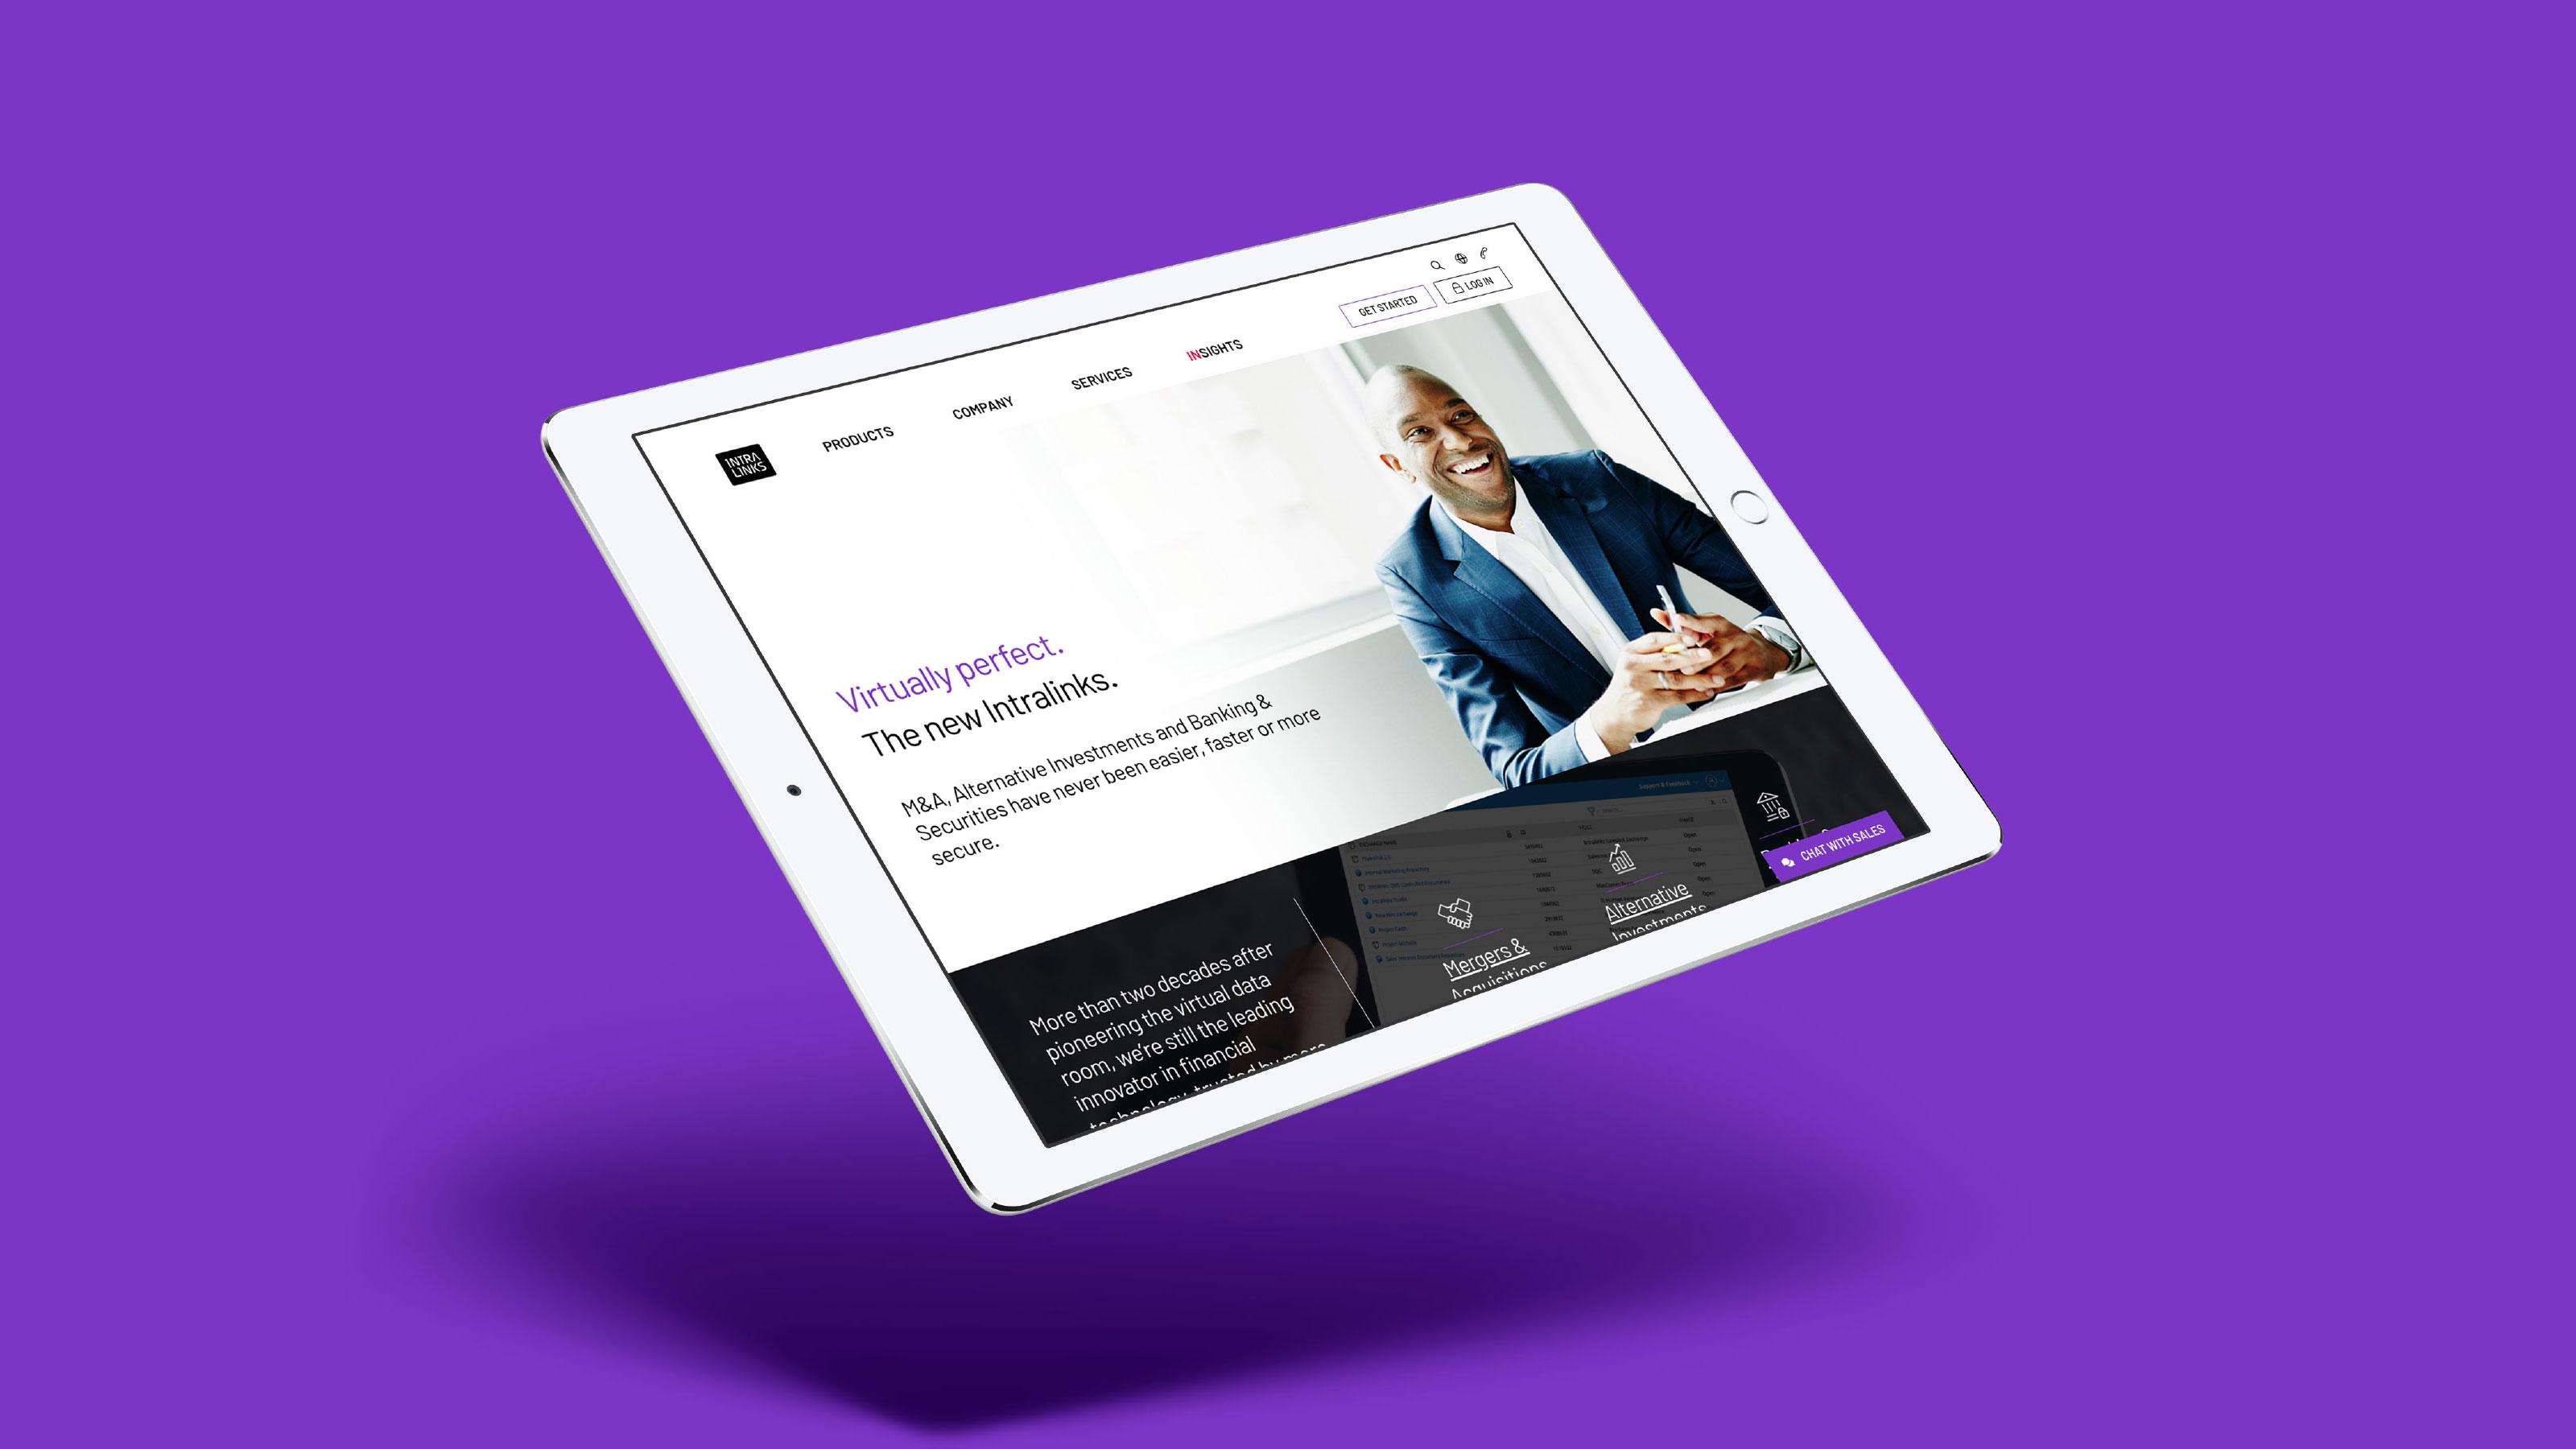 Intralinks Brand tablet design screen